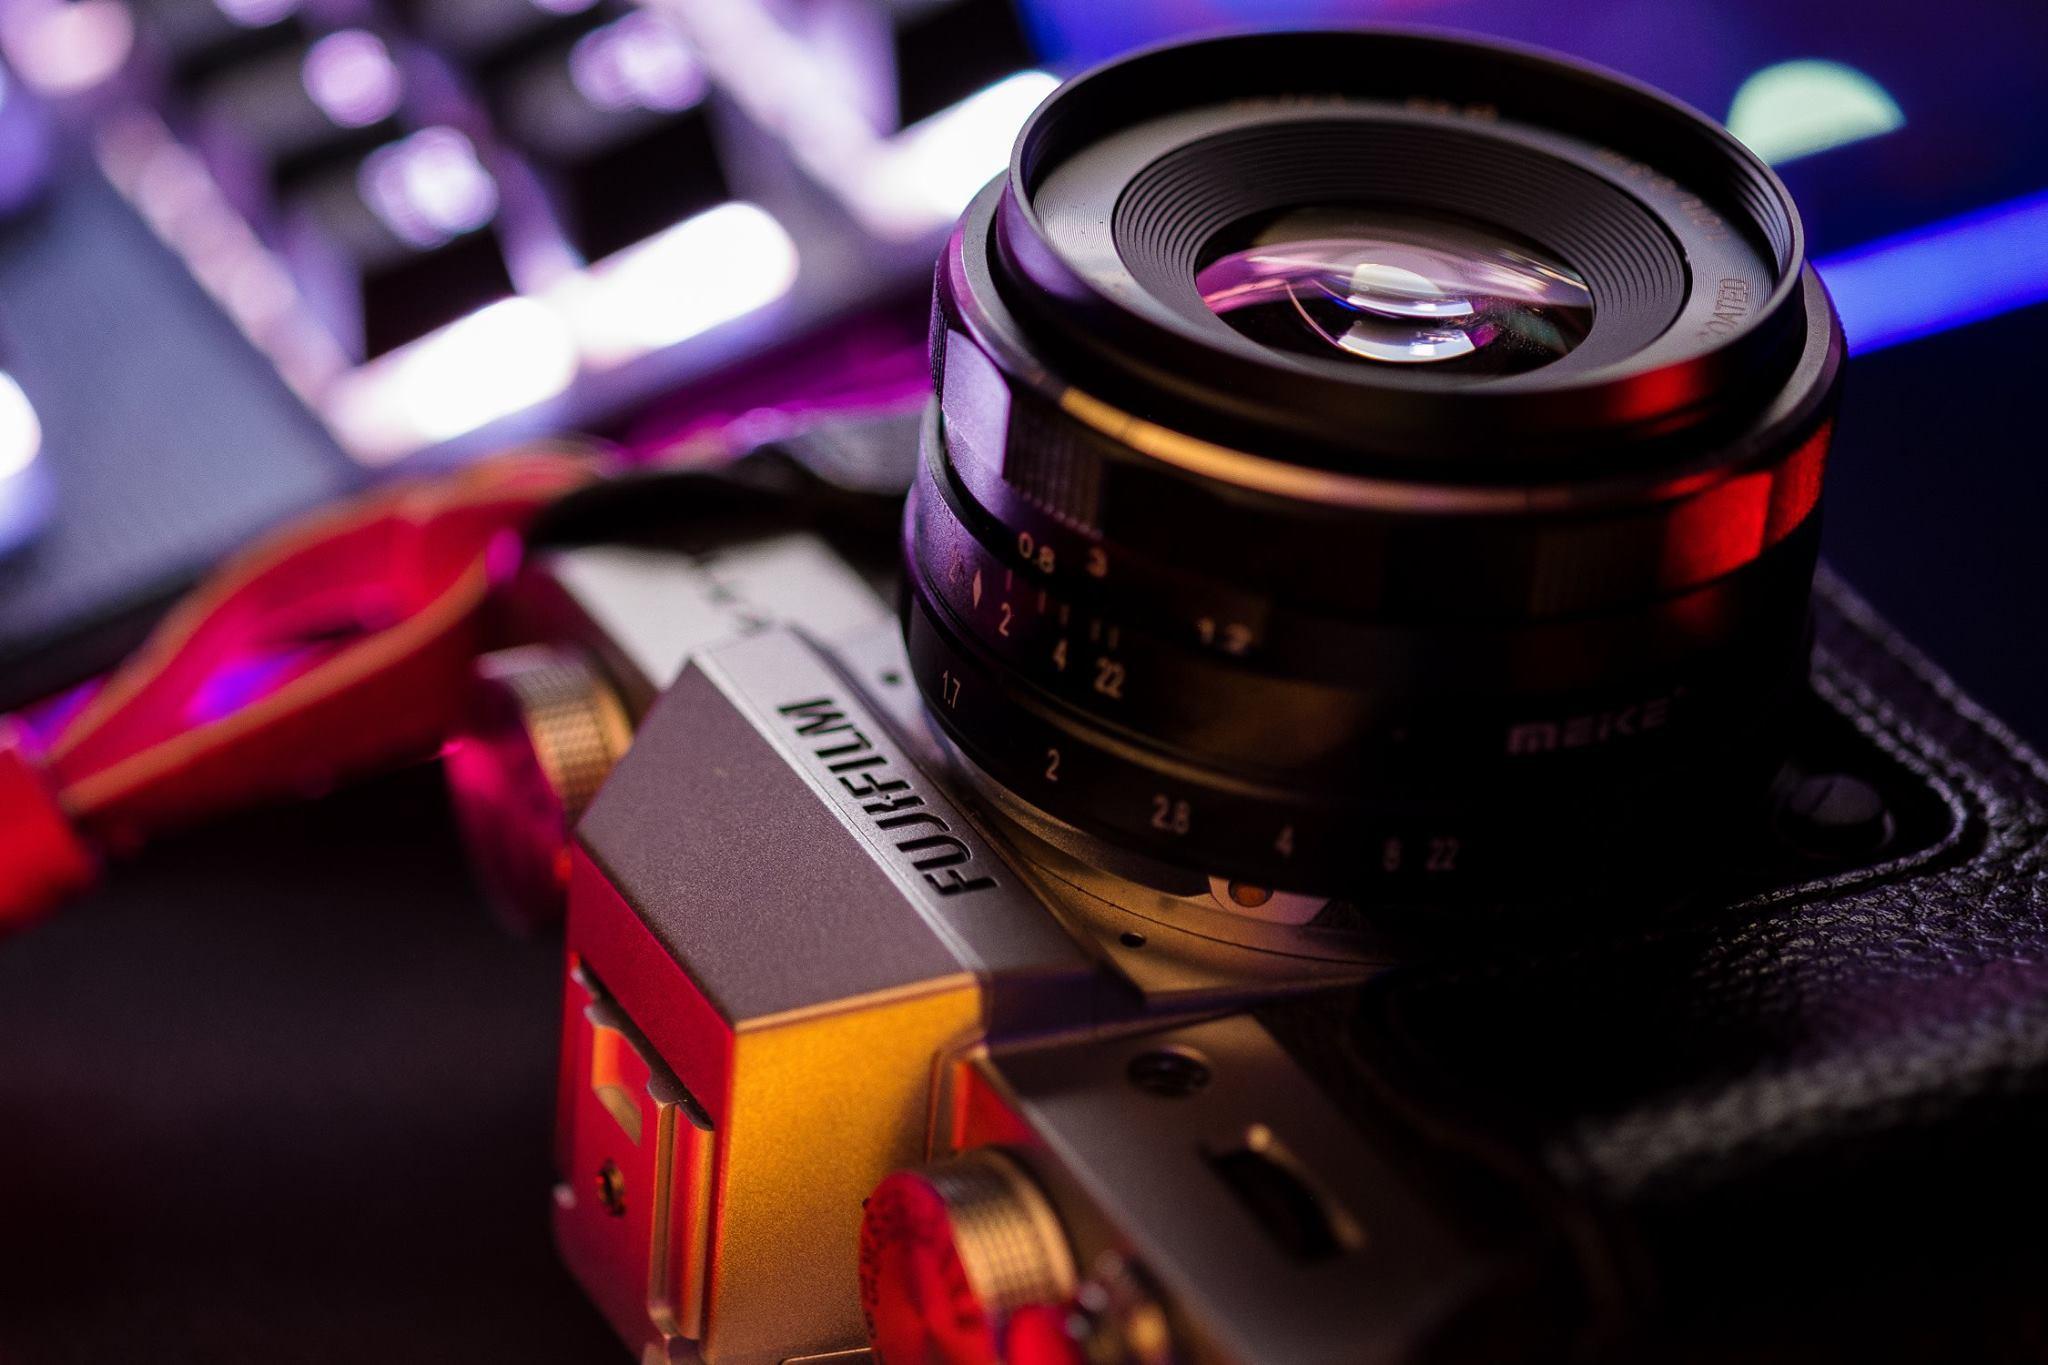 My first Fujifilm camera. Fujifilm X-T10.